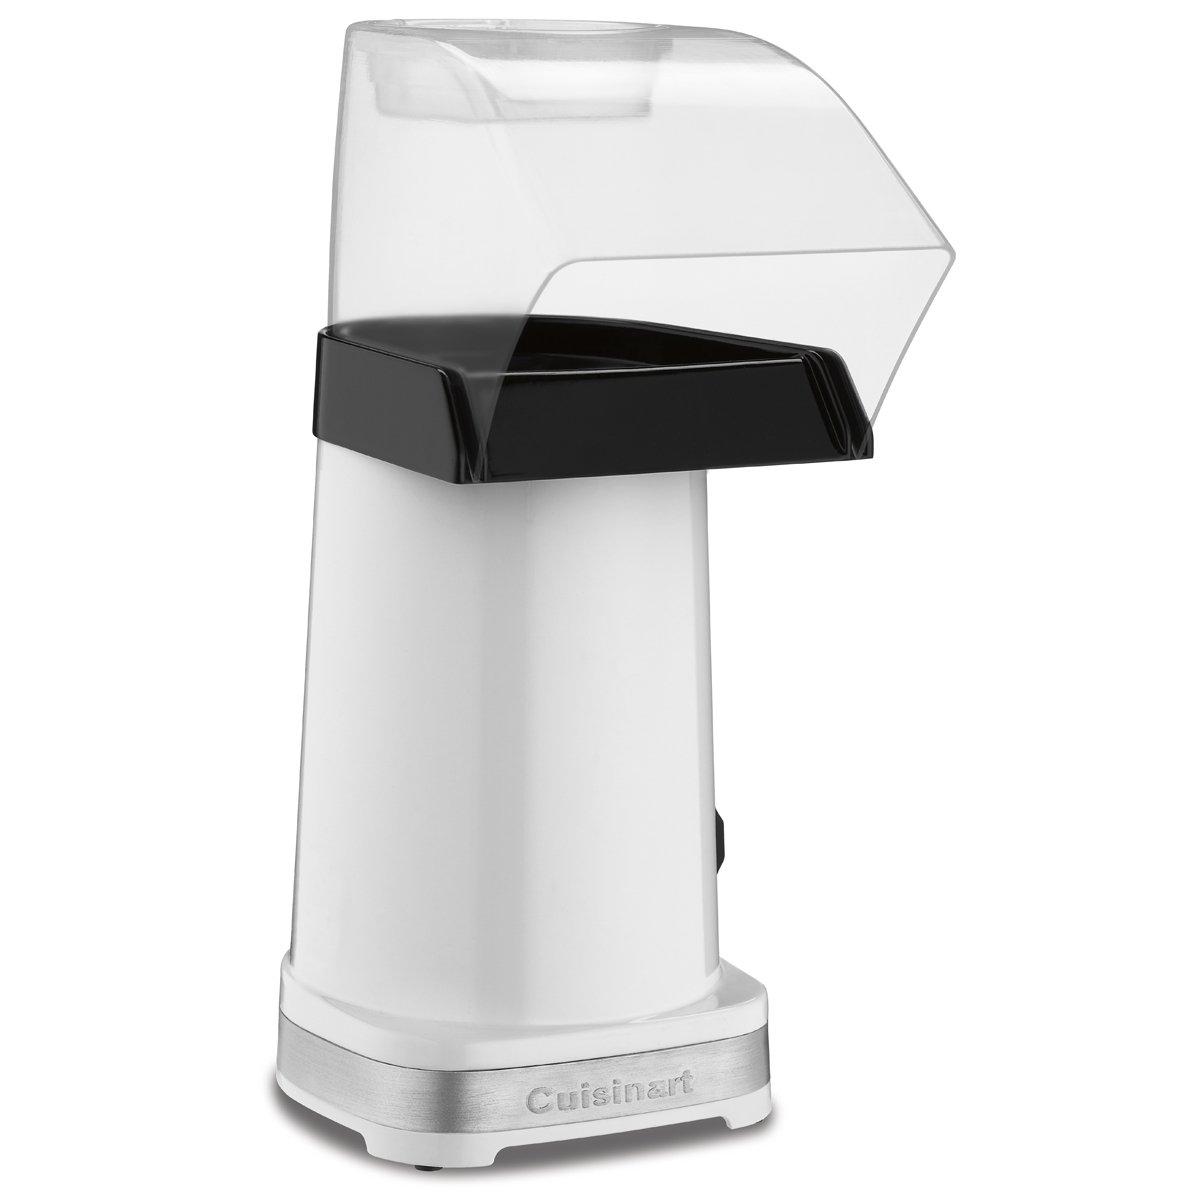 CUISINART CPM-100W EasyPop Hot Air Popcorn Maker White